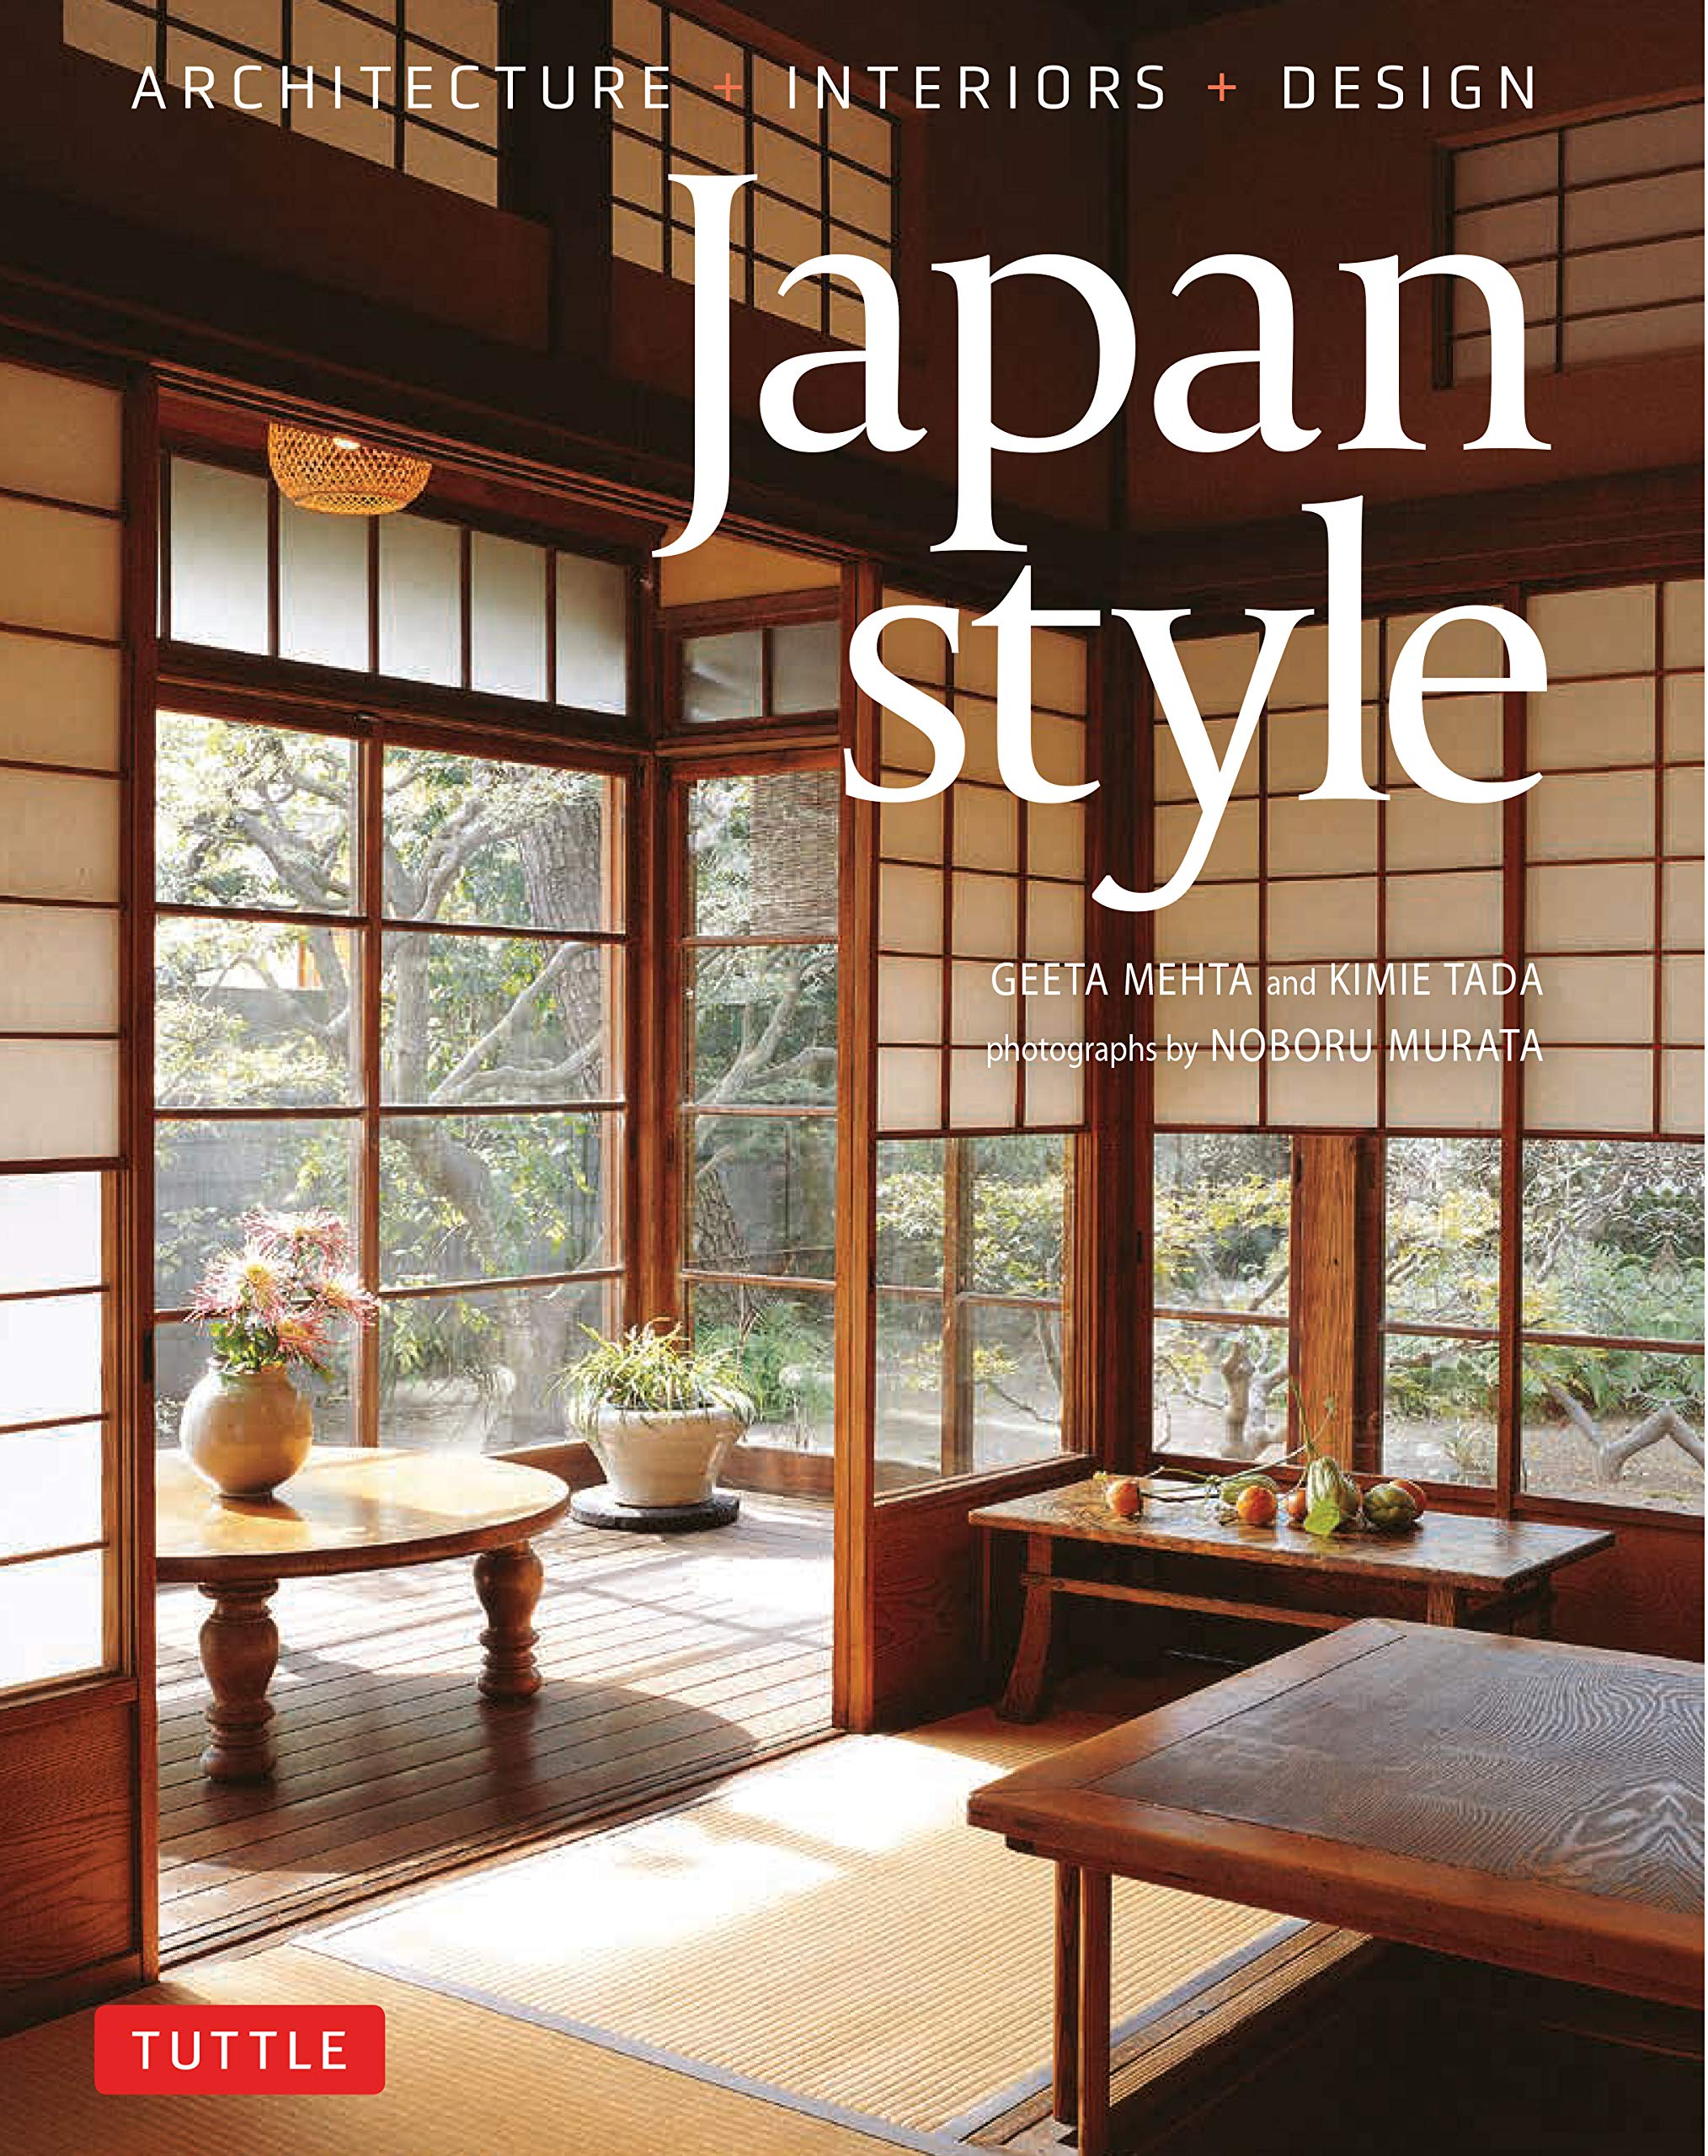 Japan Style  Architecture + Interiors + Design